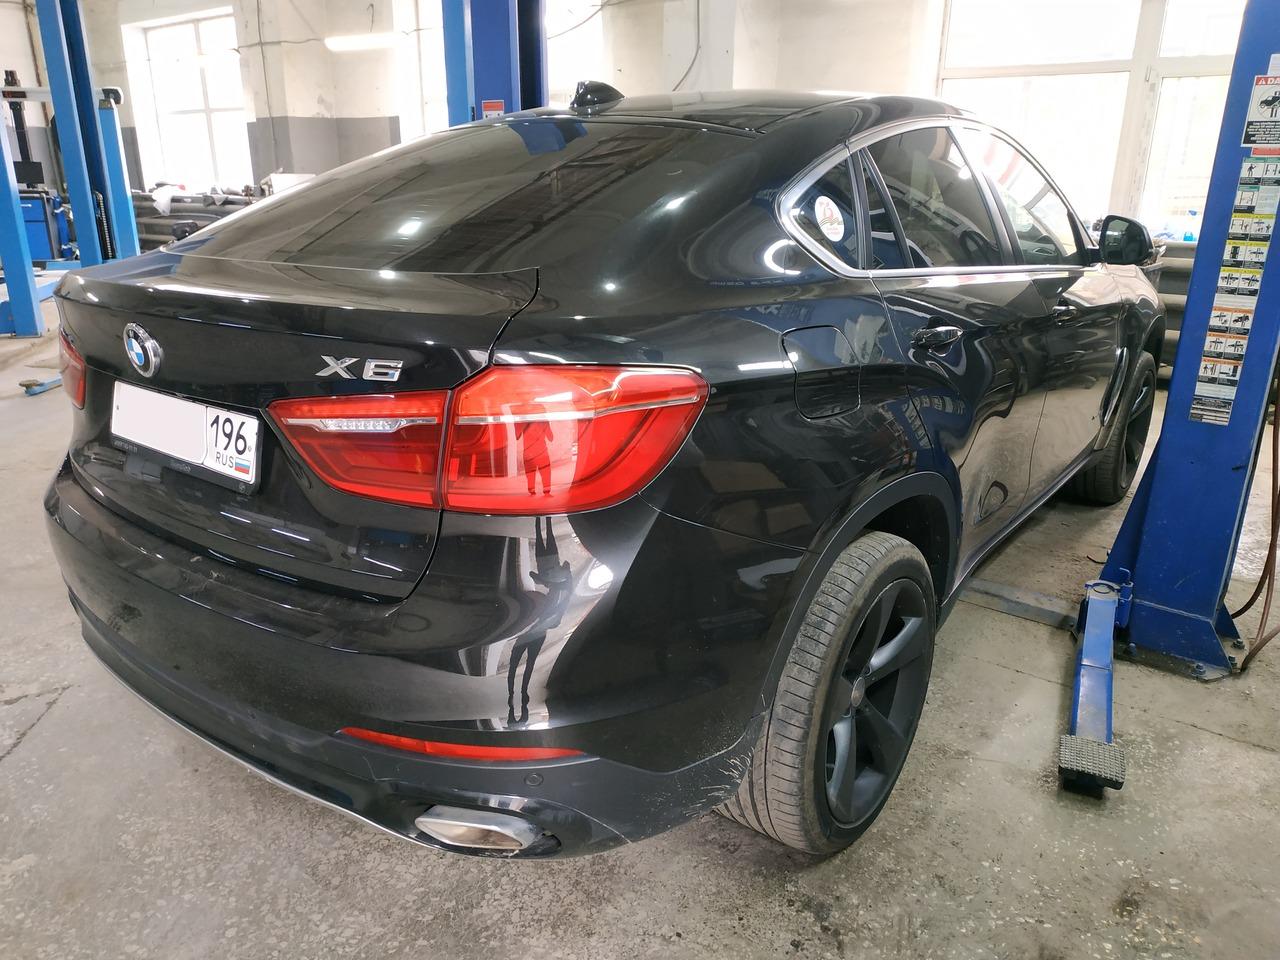 BMW X6 F16 30d, вид сзади